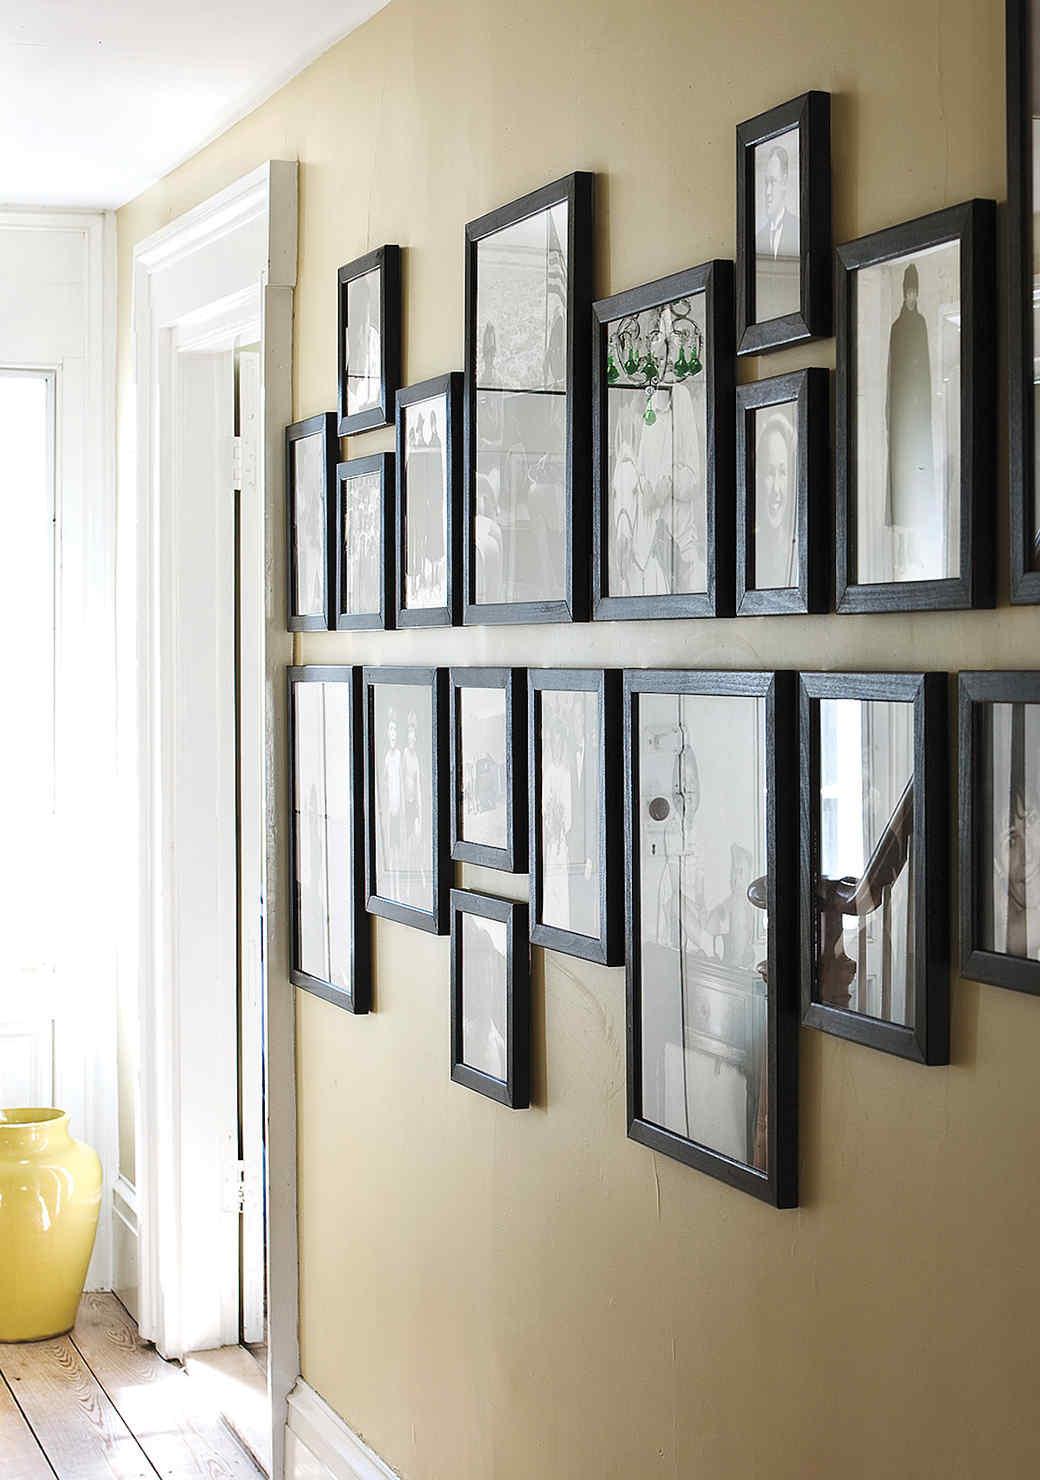 gallery-pictures-frames-1016.jpg (skyword:349120)